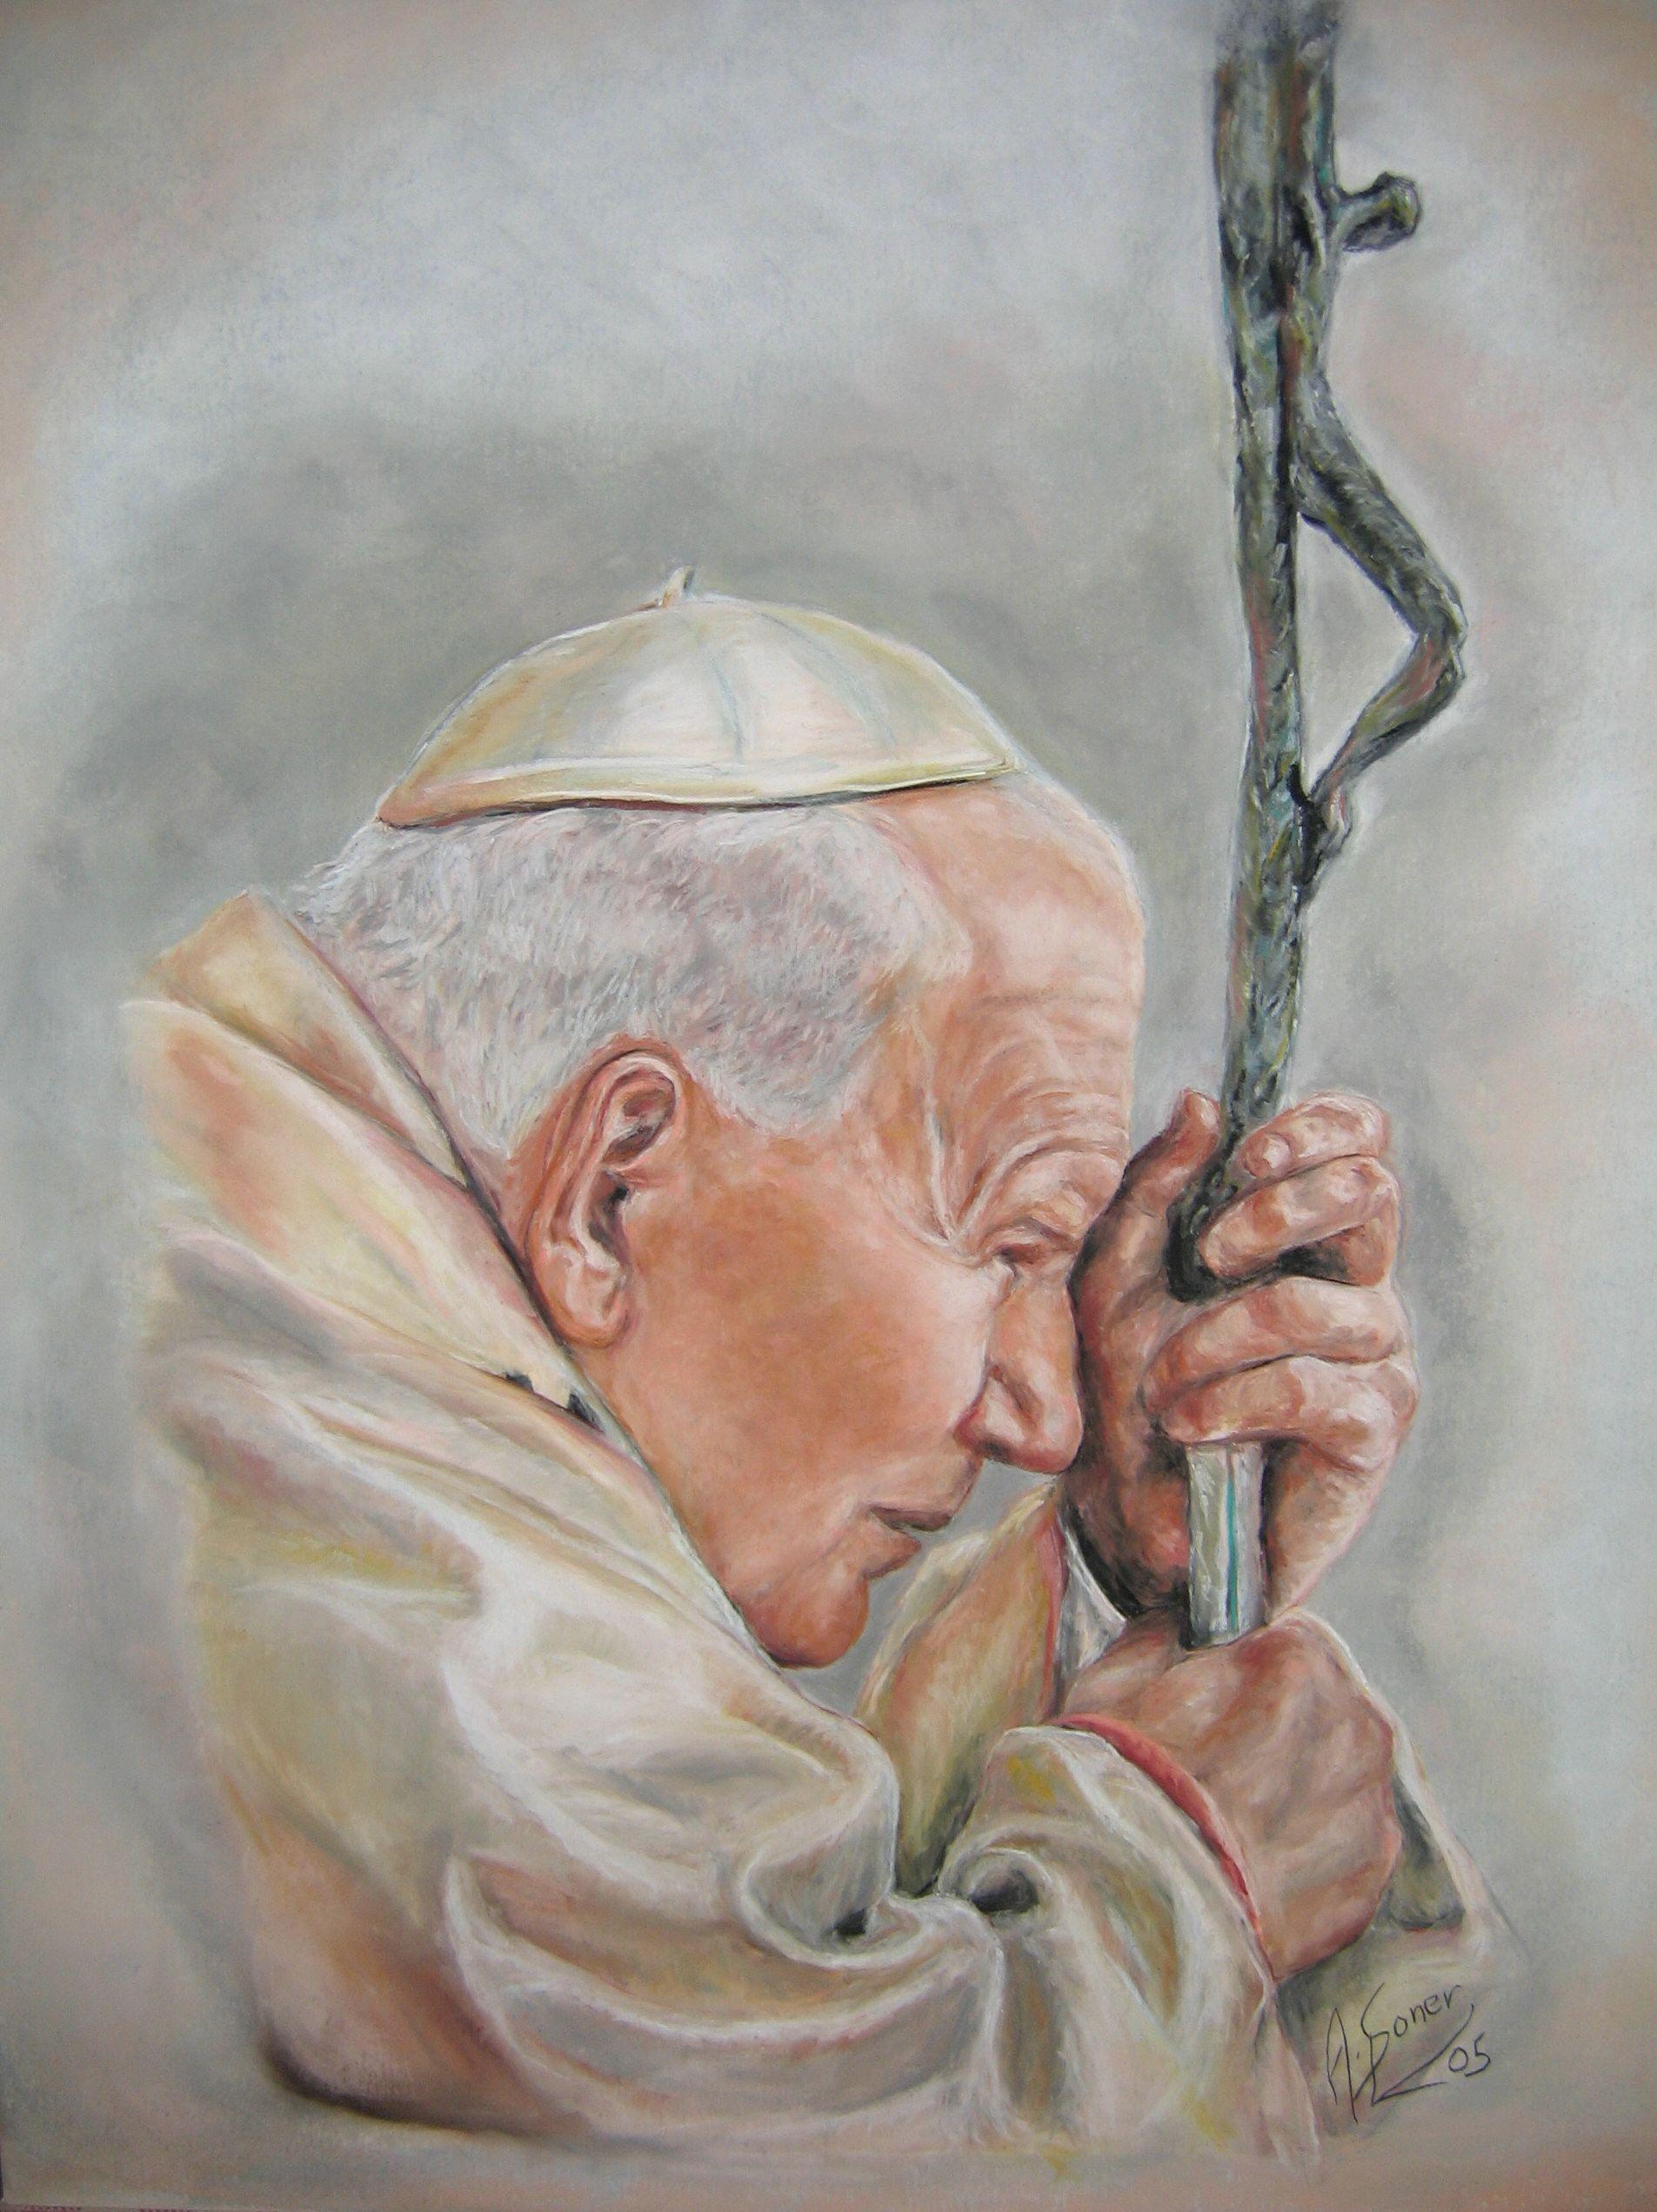 Pin By Juan Ramirez On Saint Pope John Paul Ii Pope John Paul Ii Pope Saint John Paul Ii St John Paul Ii